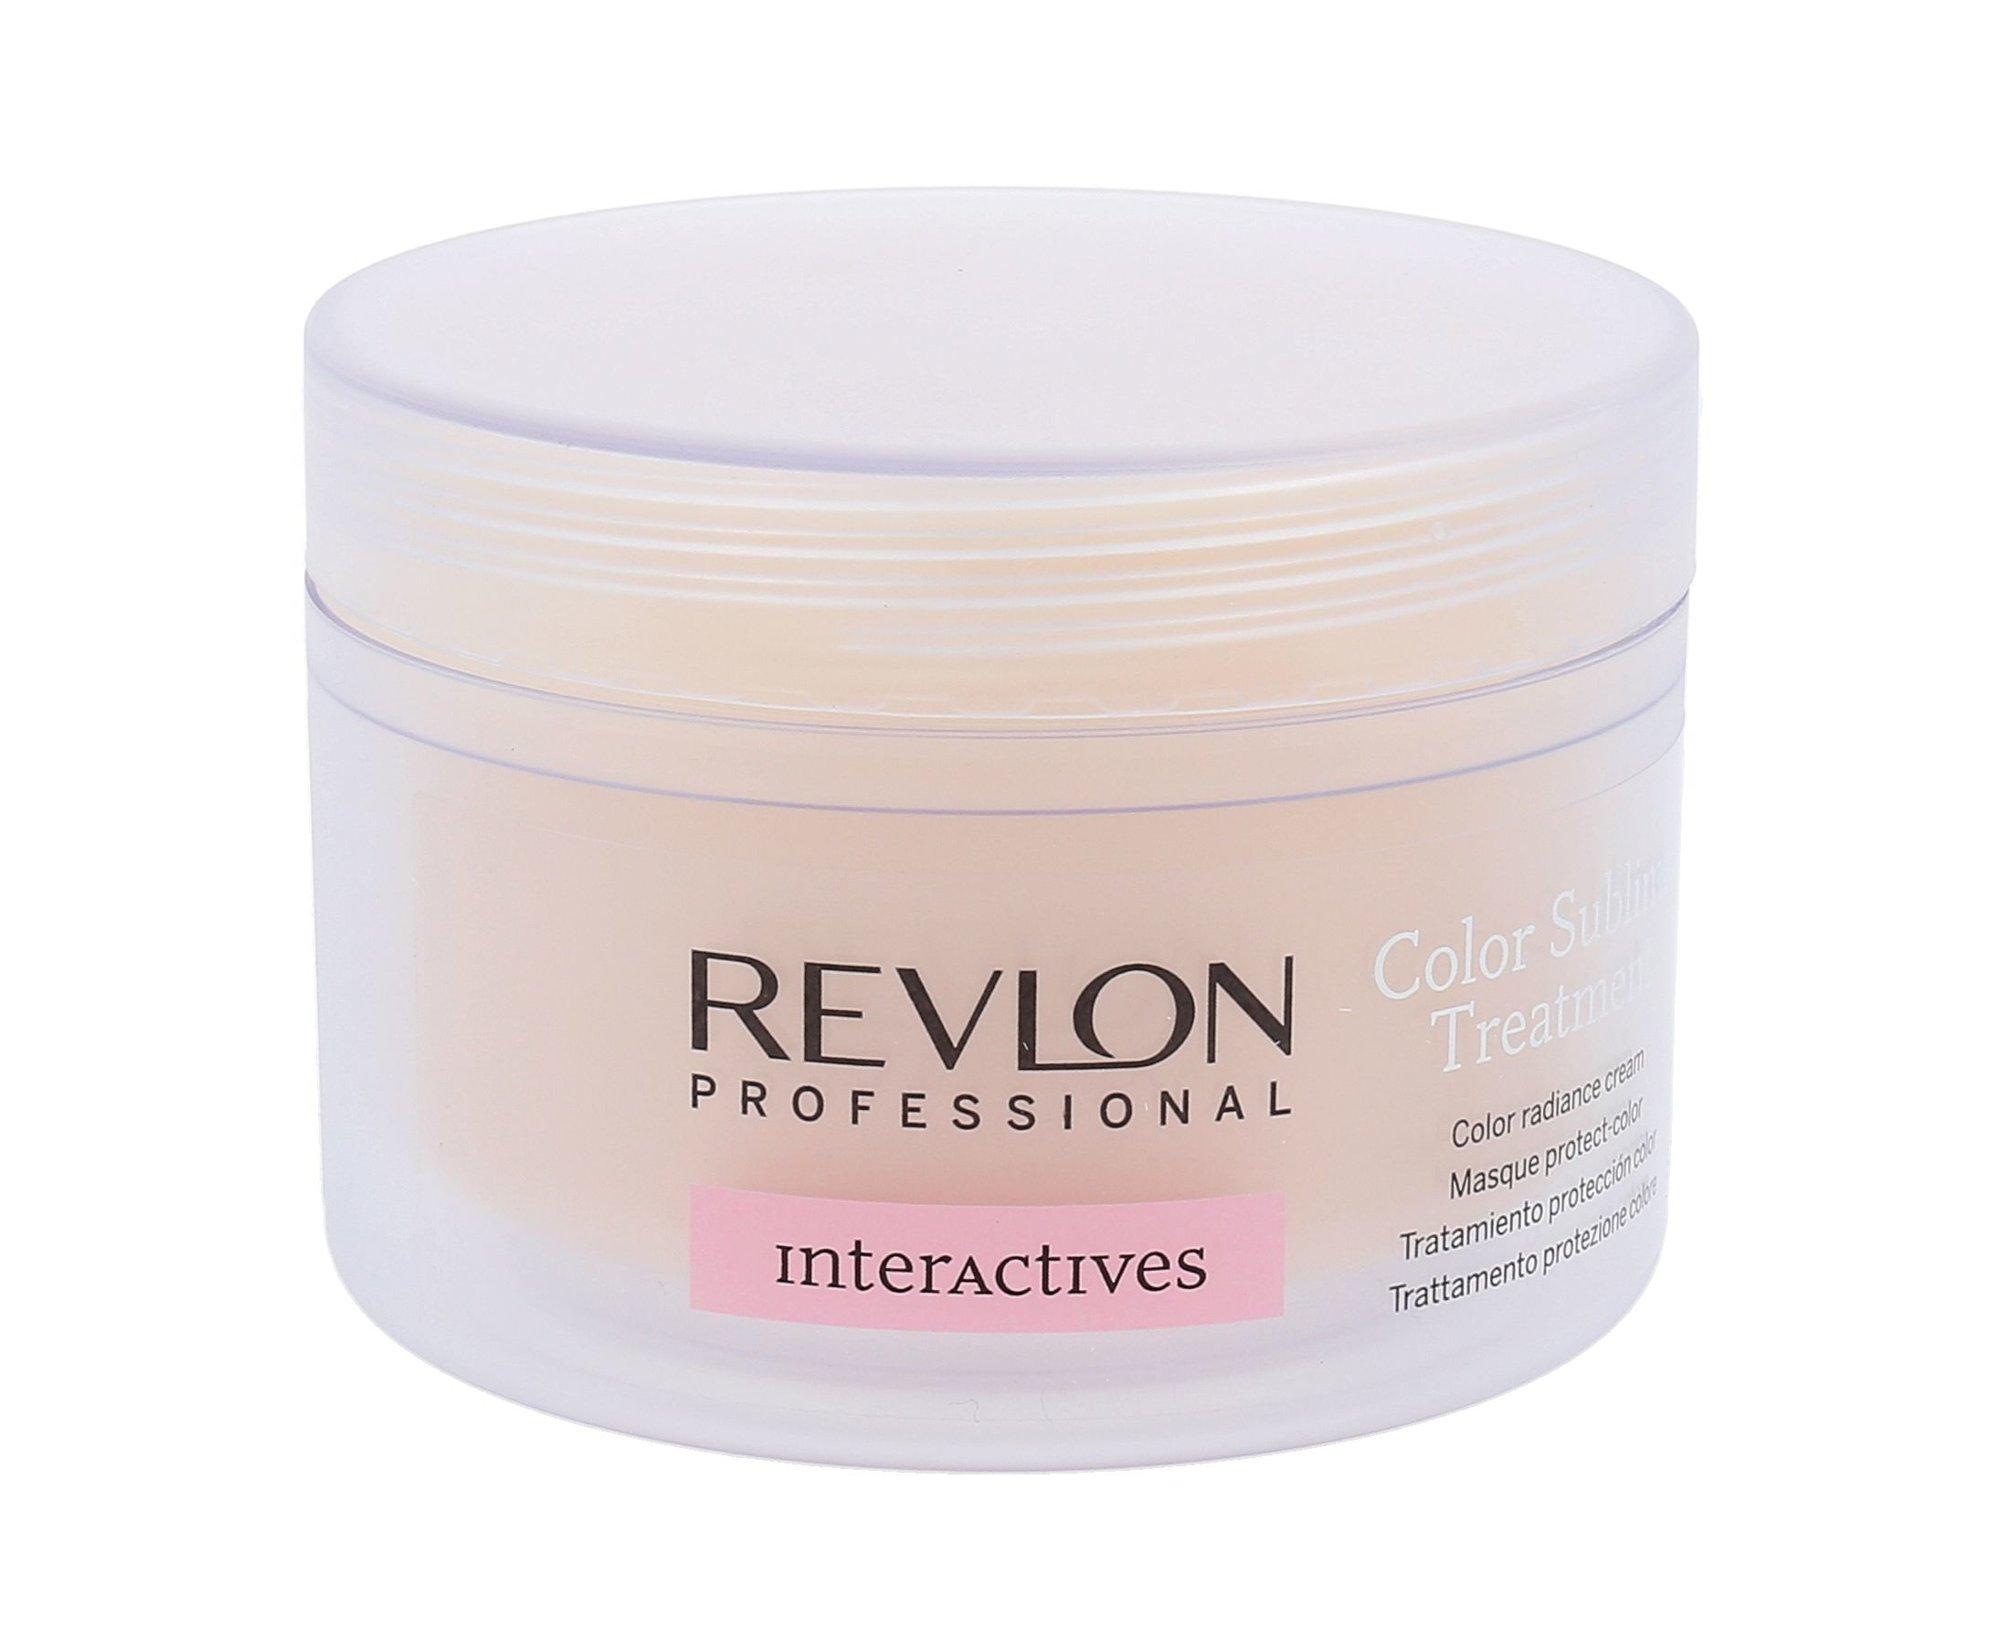 Revlon Professional Interactives Cosmetic 200ml